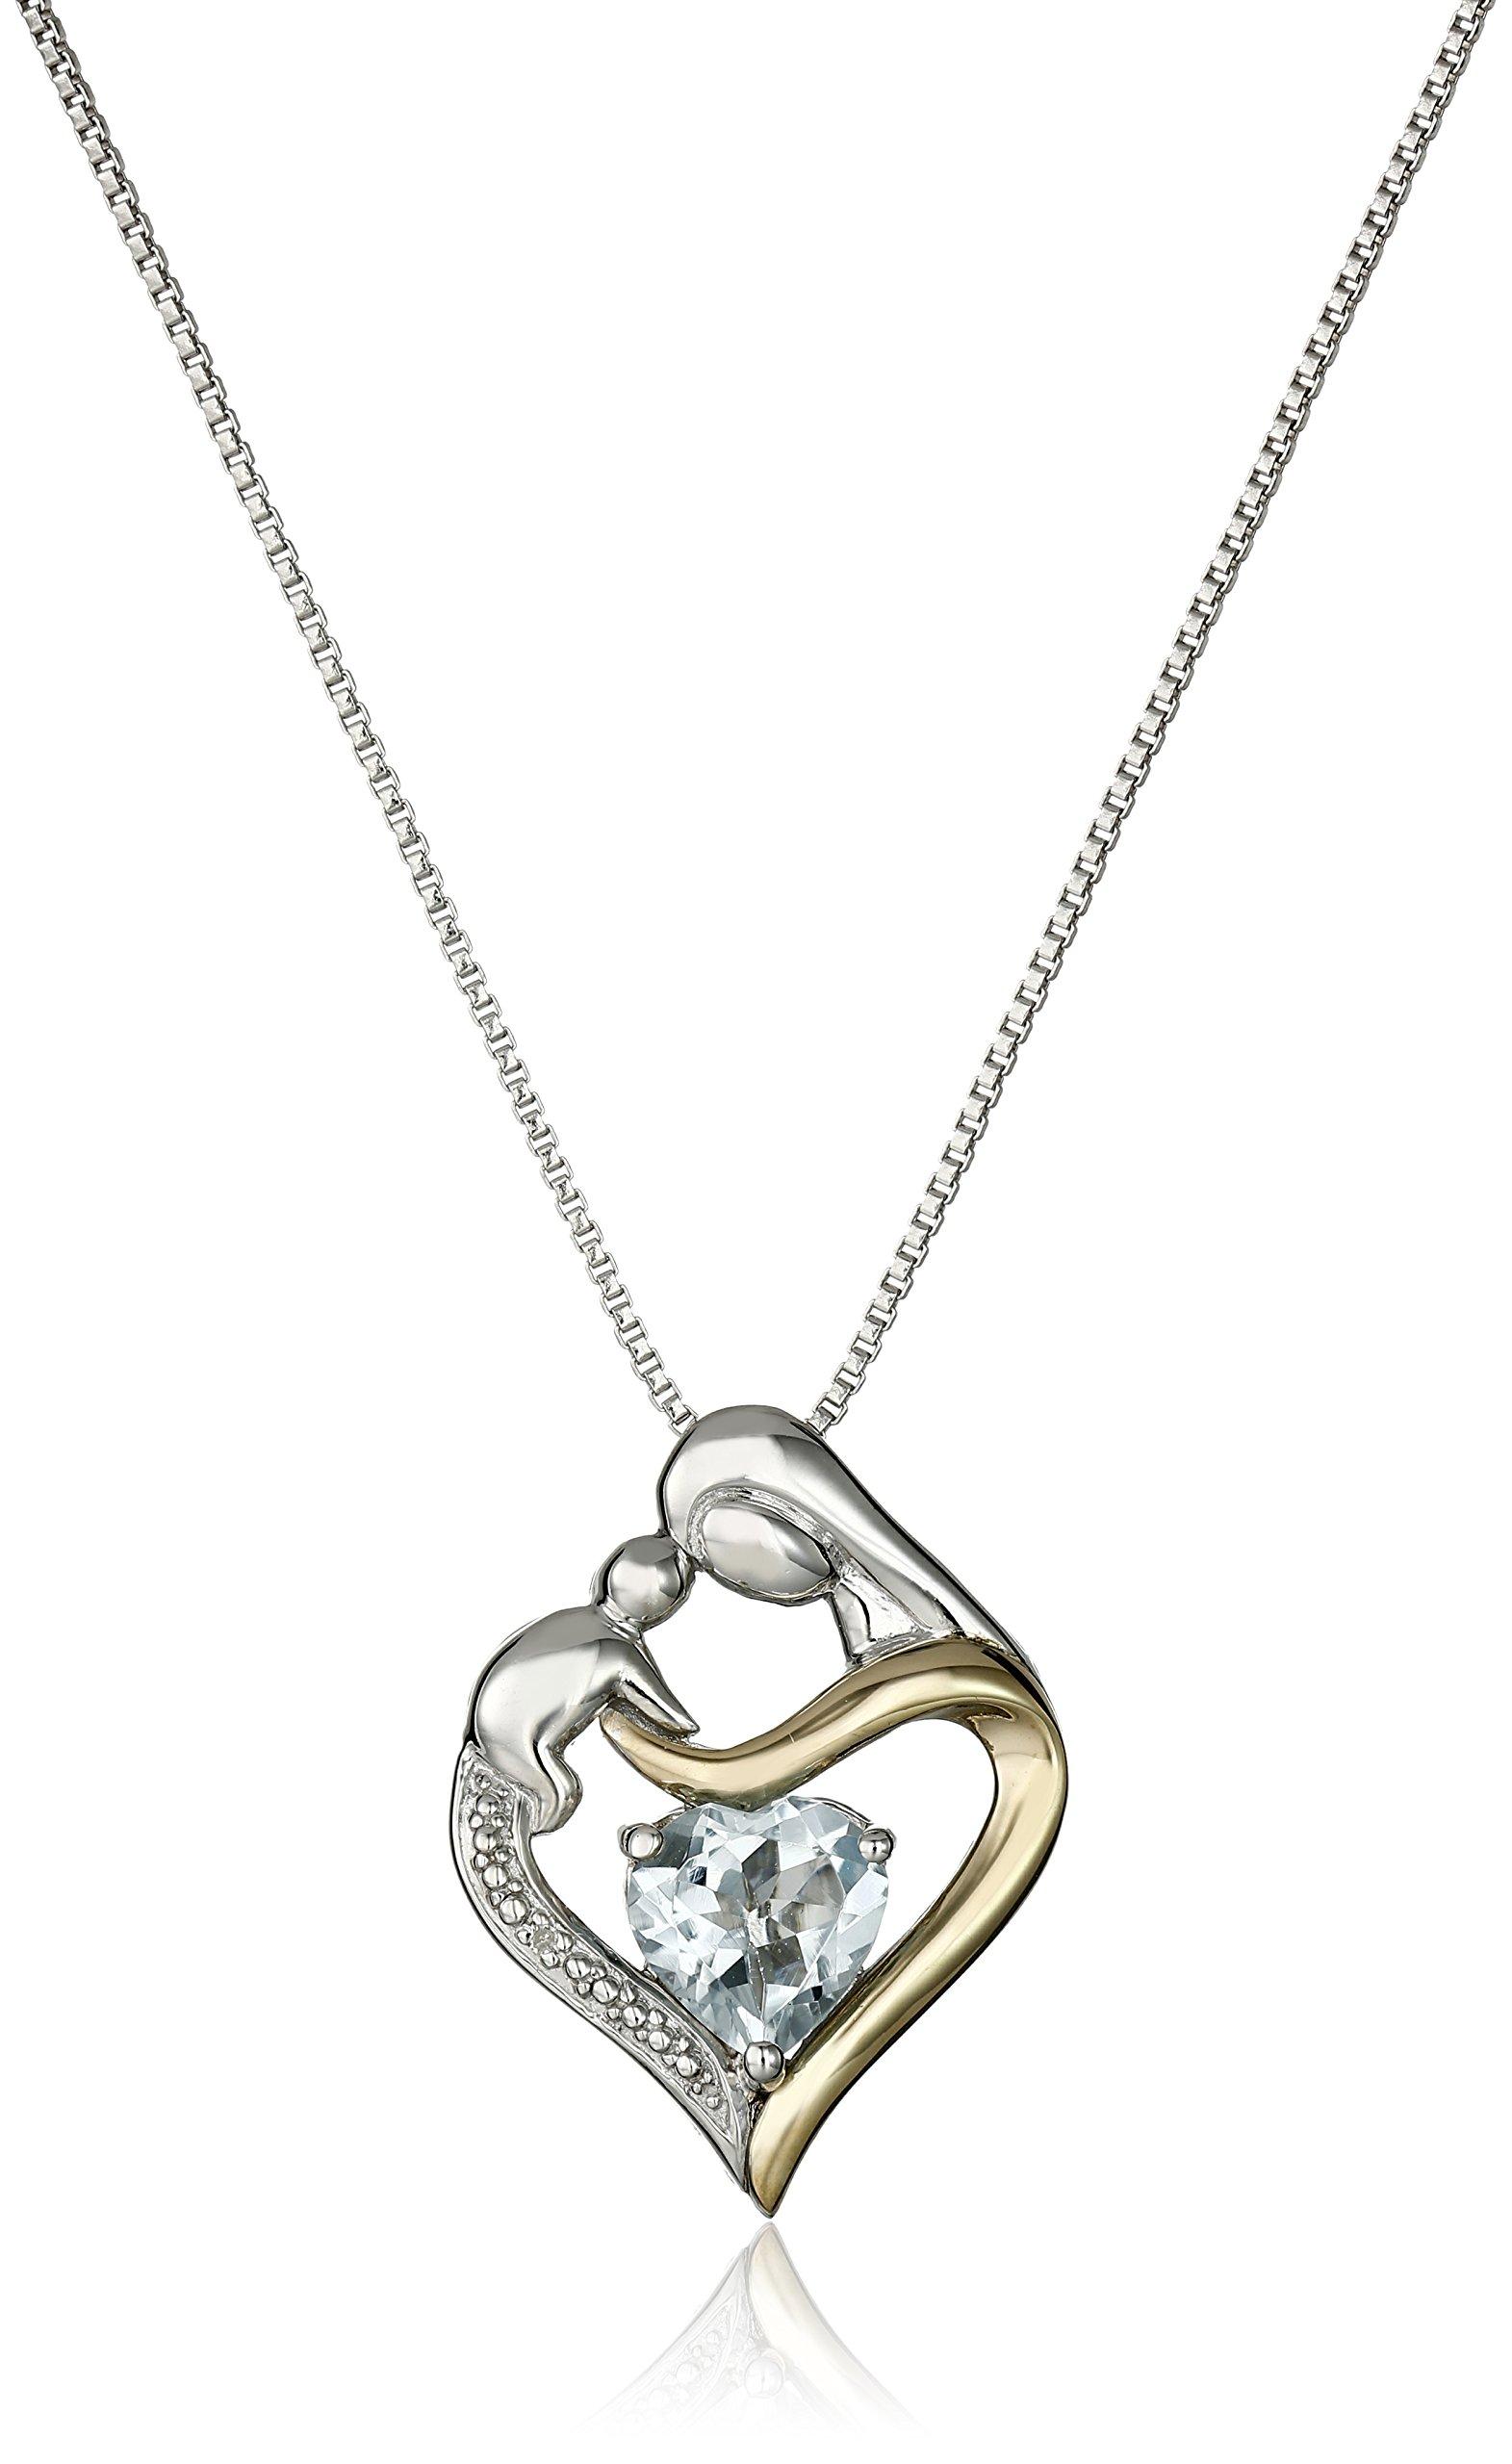 Sterling Silver and 14k Gold Heart Mom Pendant Necklace 18   sc 1 st  Amazon.com & Push Present: Amazon.com